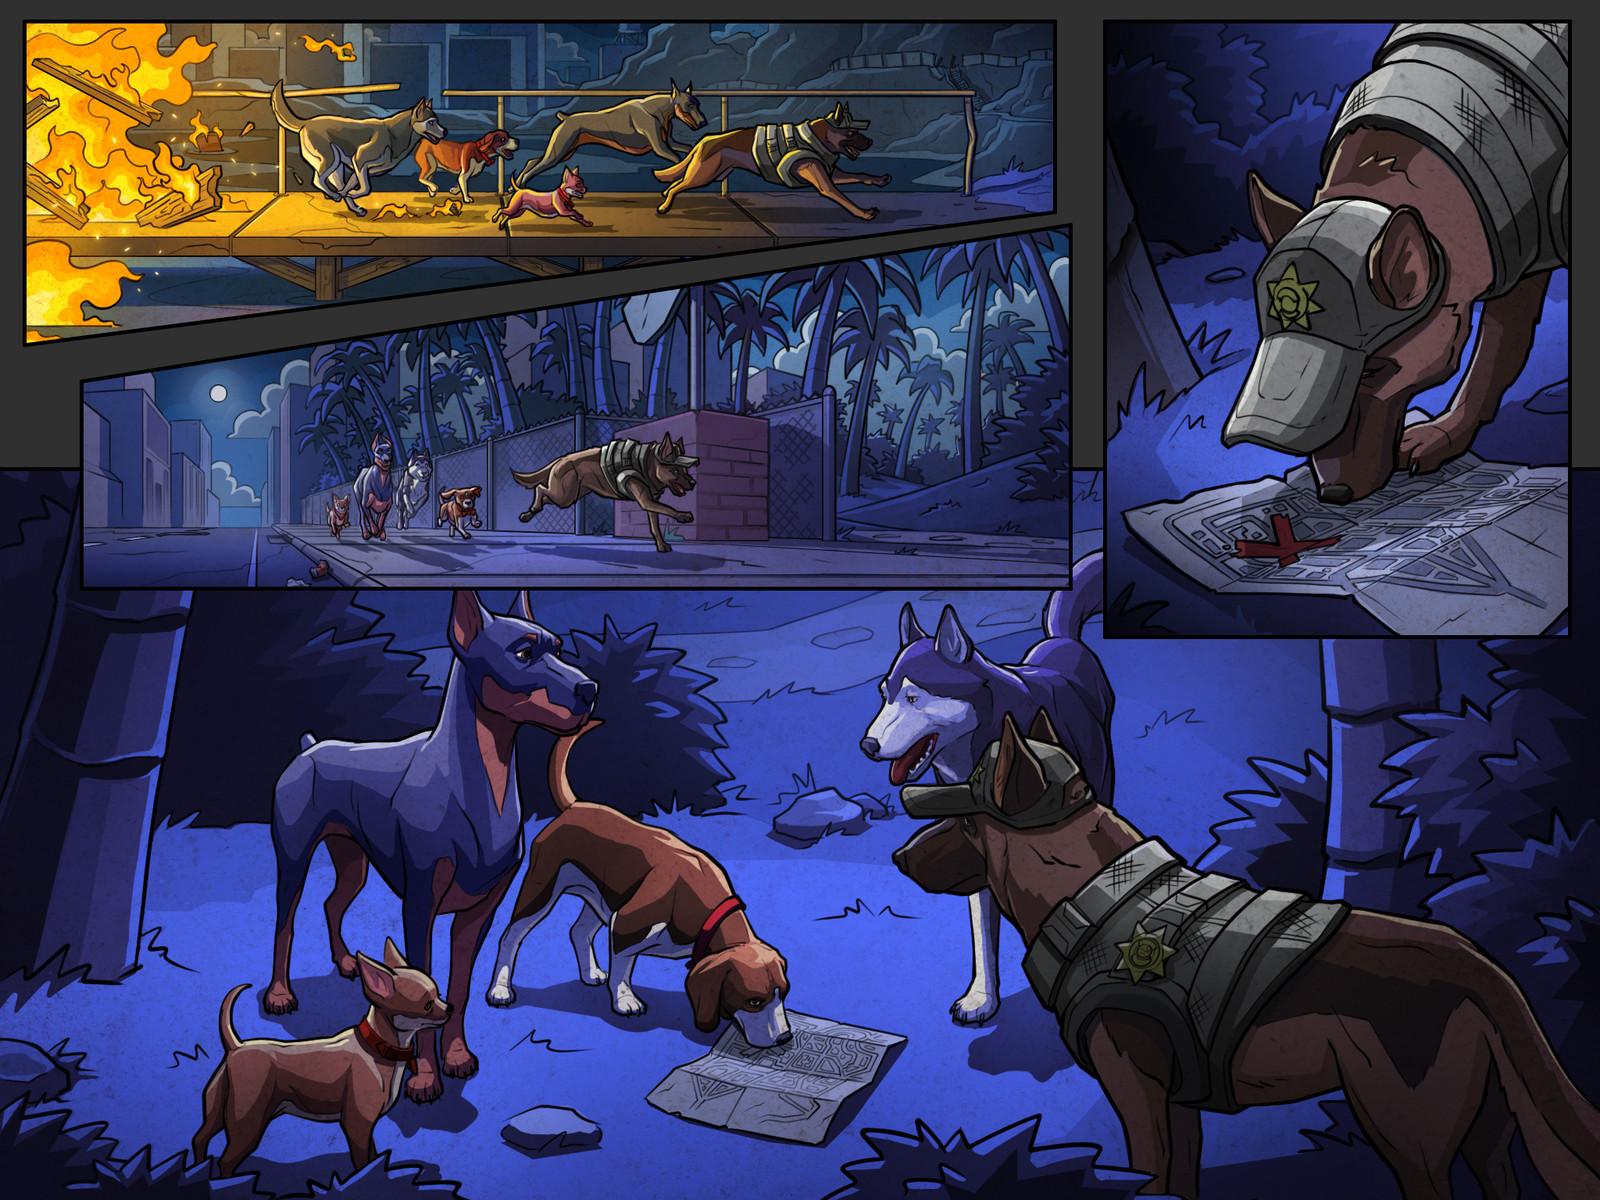 Get 'Em game cutscene comics Pg 8 Color  Behdad Sami Interactive © 2018